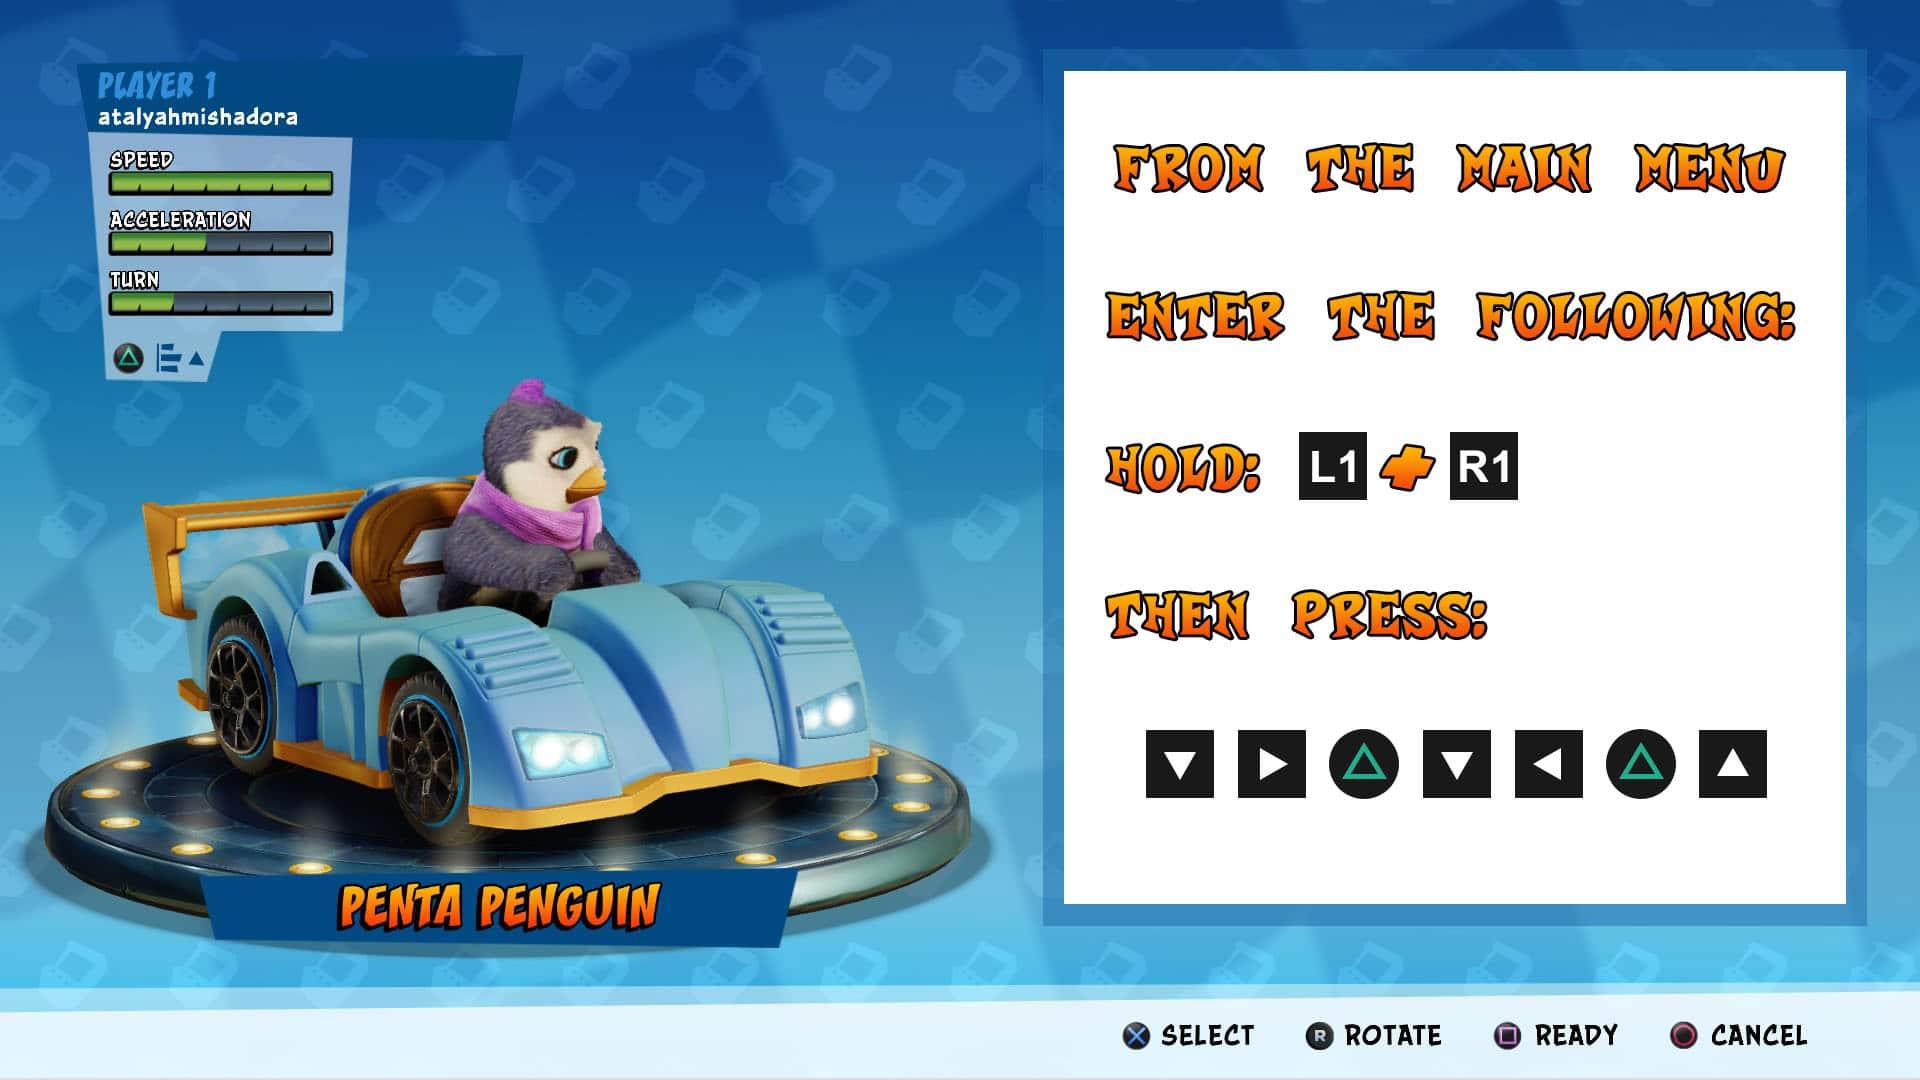 How to unlock Penta Pengiun in Crash Team Racing Nitro Fueled